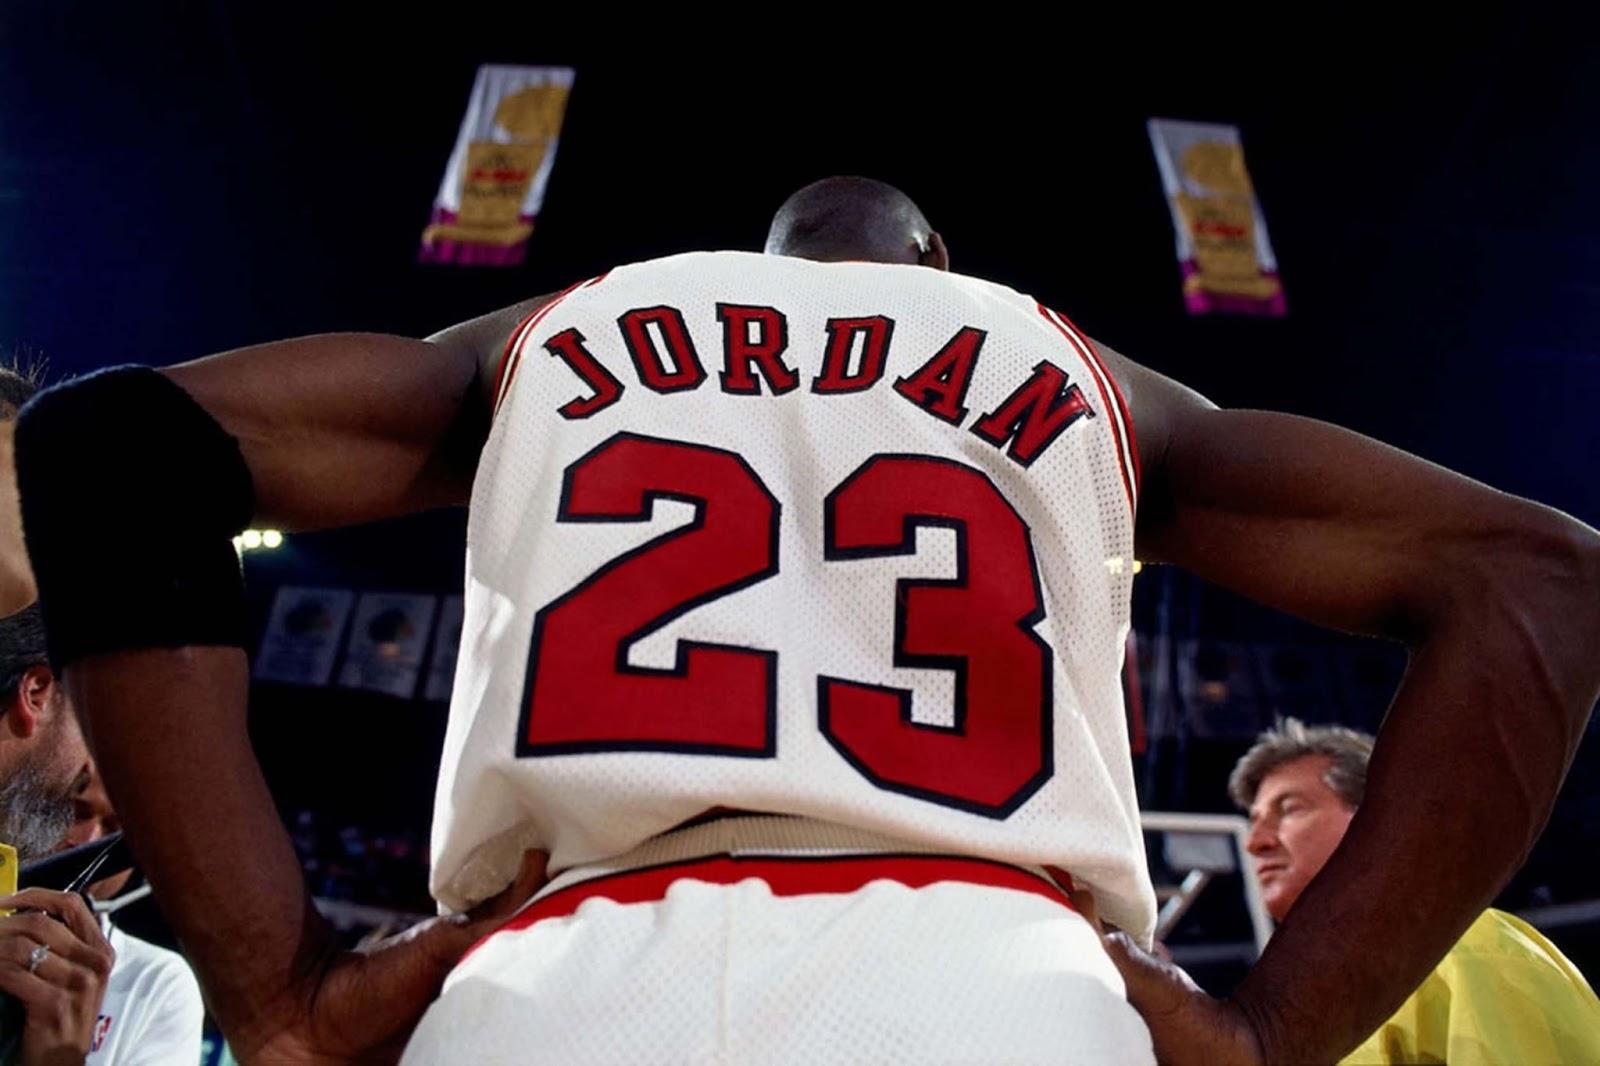 The Cat's Pajamas: Michael Jordan Turns 50